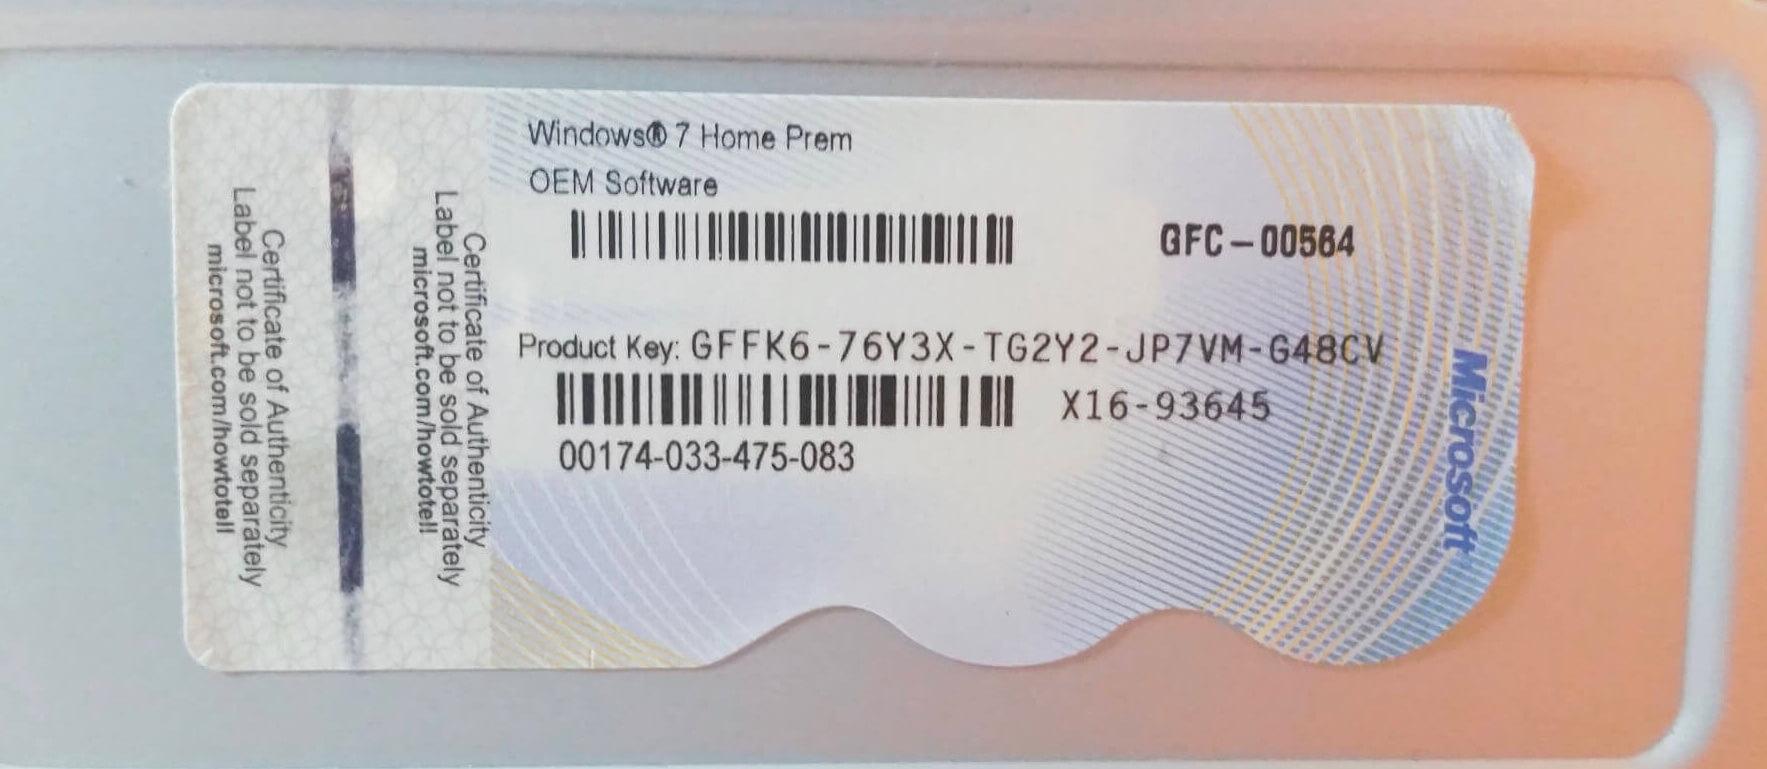 find oem product key windows 7